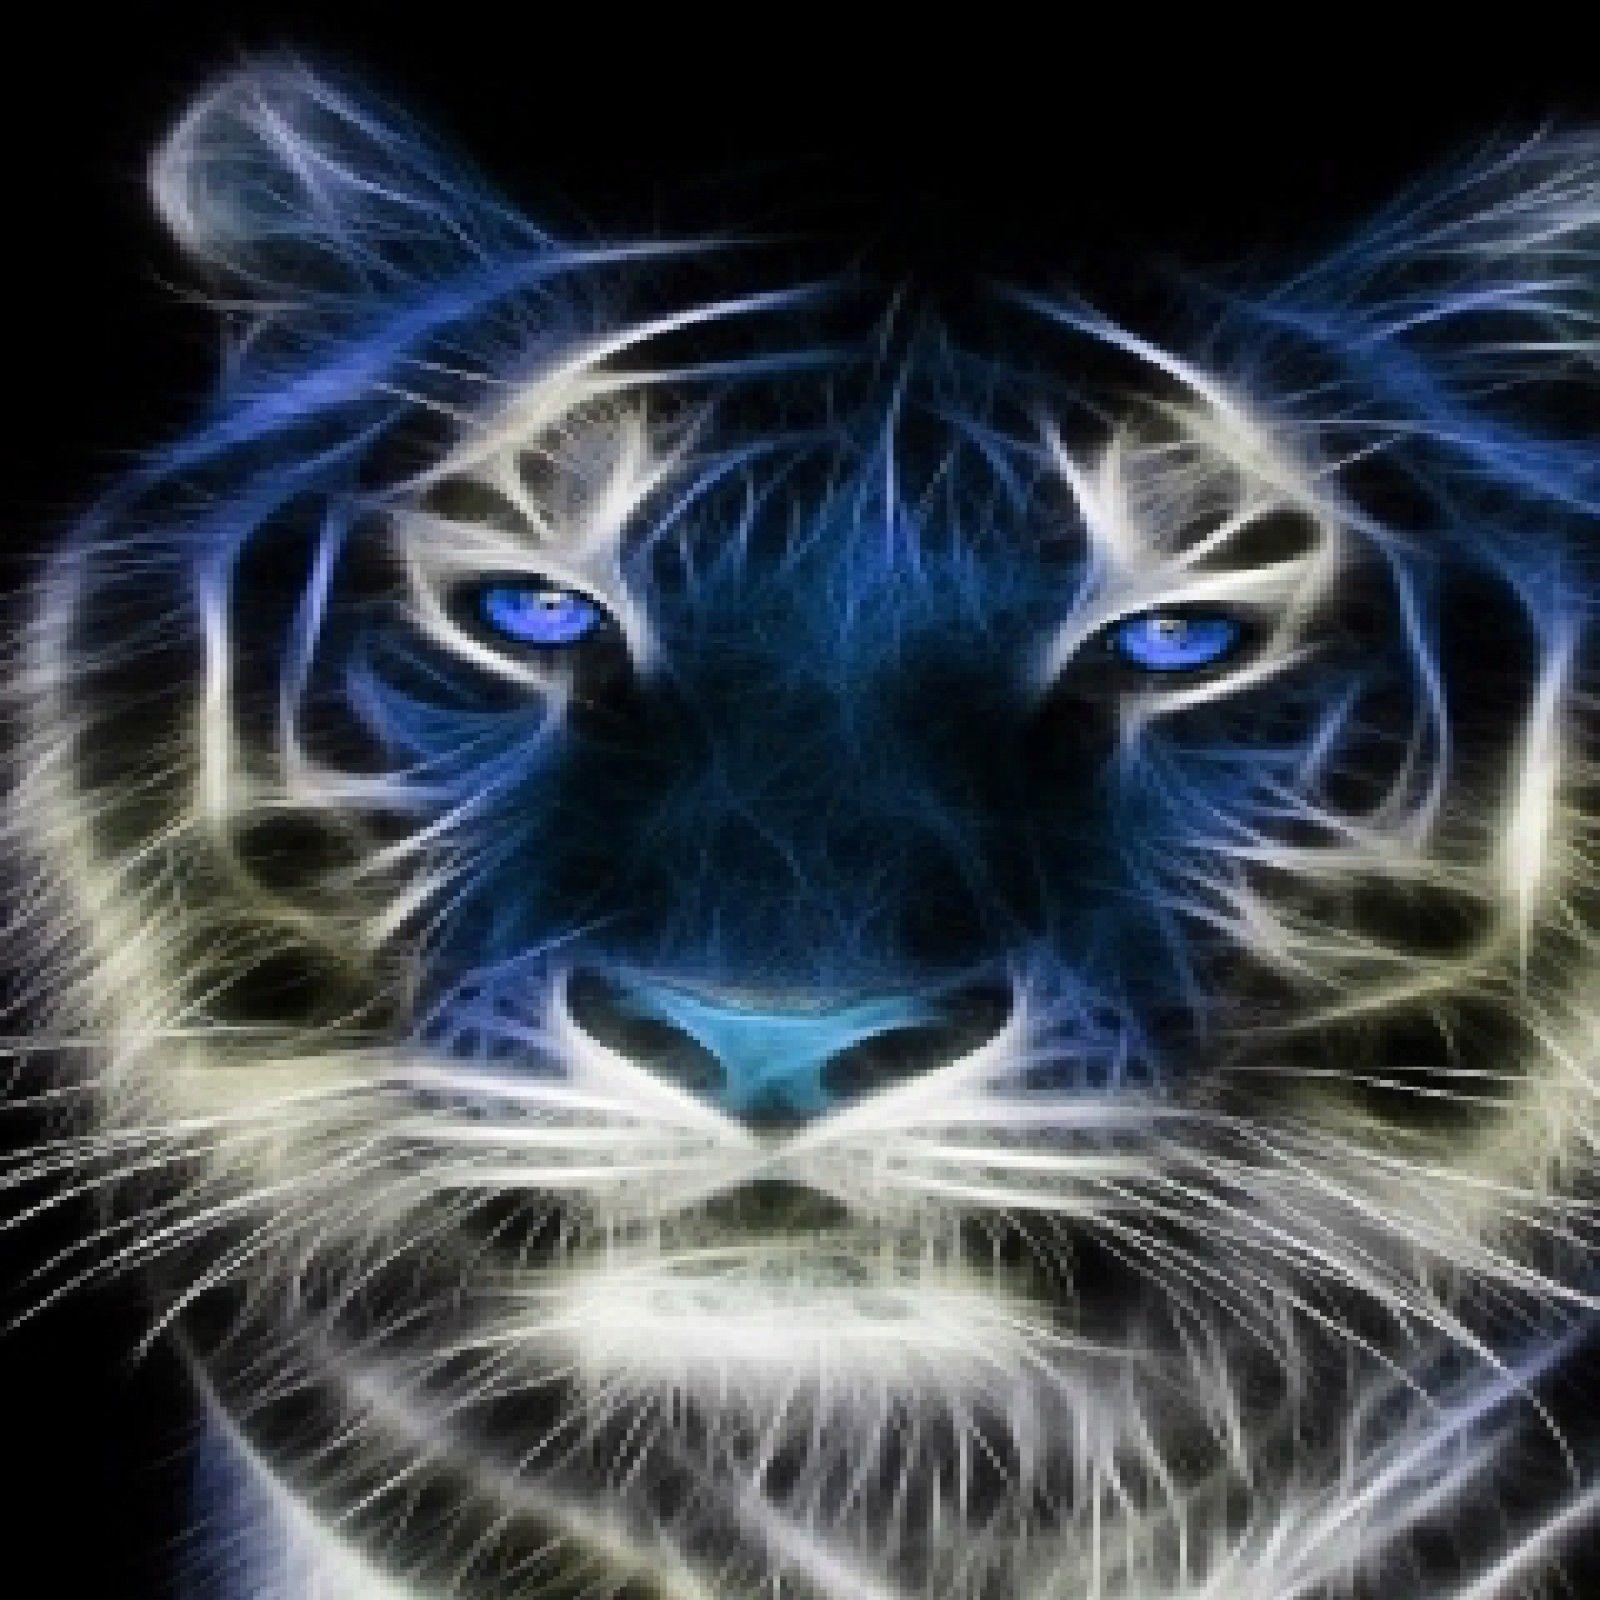 Blue Tiger Fractal Art Set Of 4 Rubber Backed Coasters Ebay Big Cats Art Animals Beautiful Animals